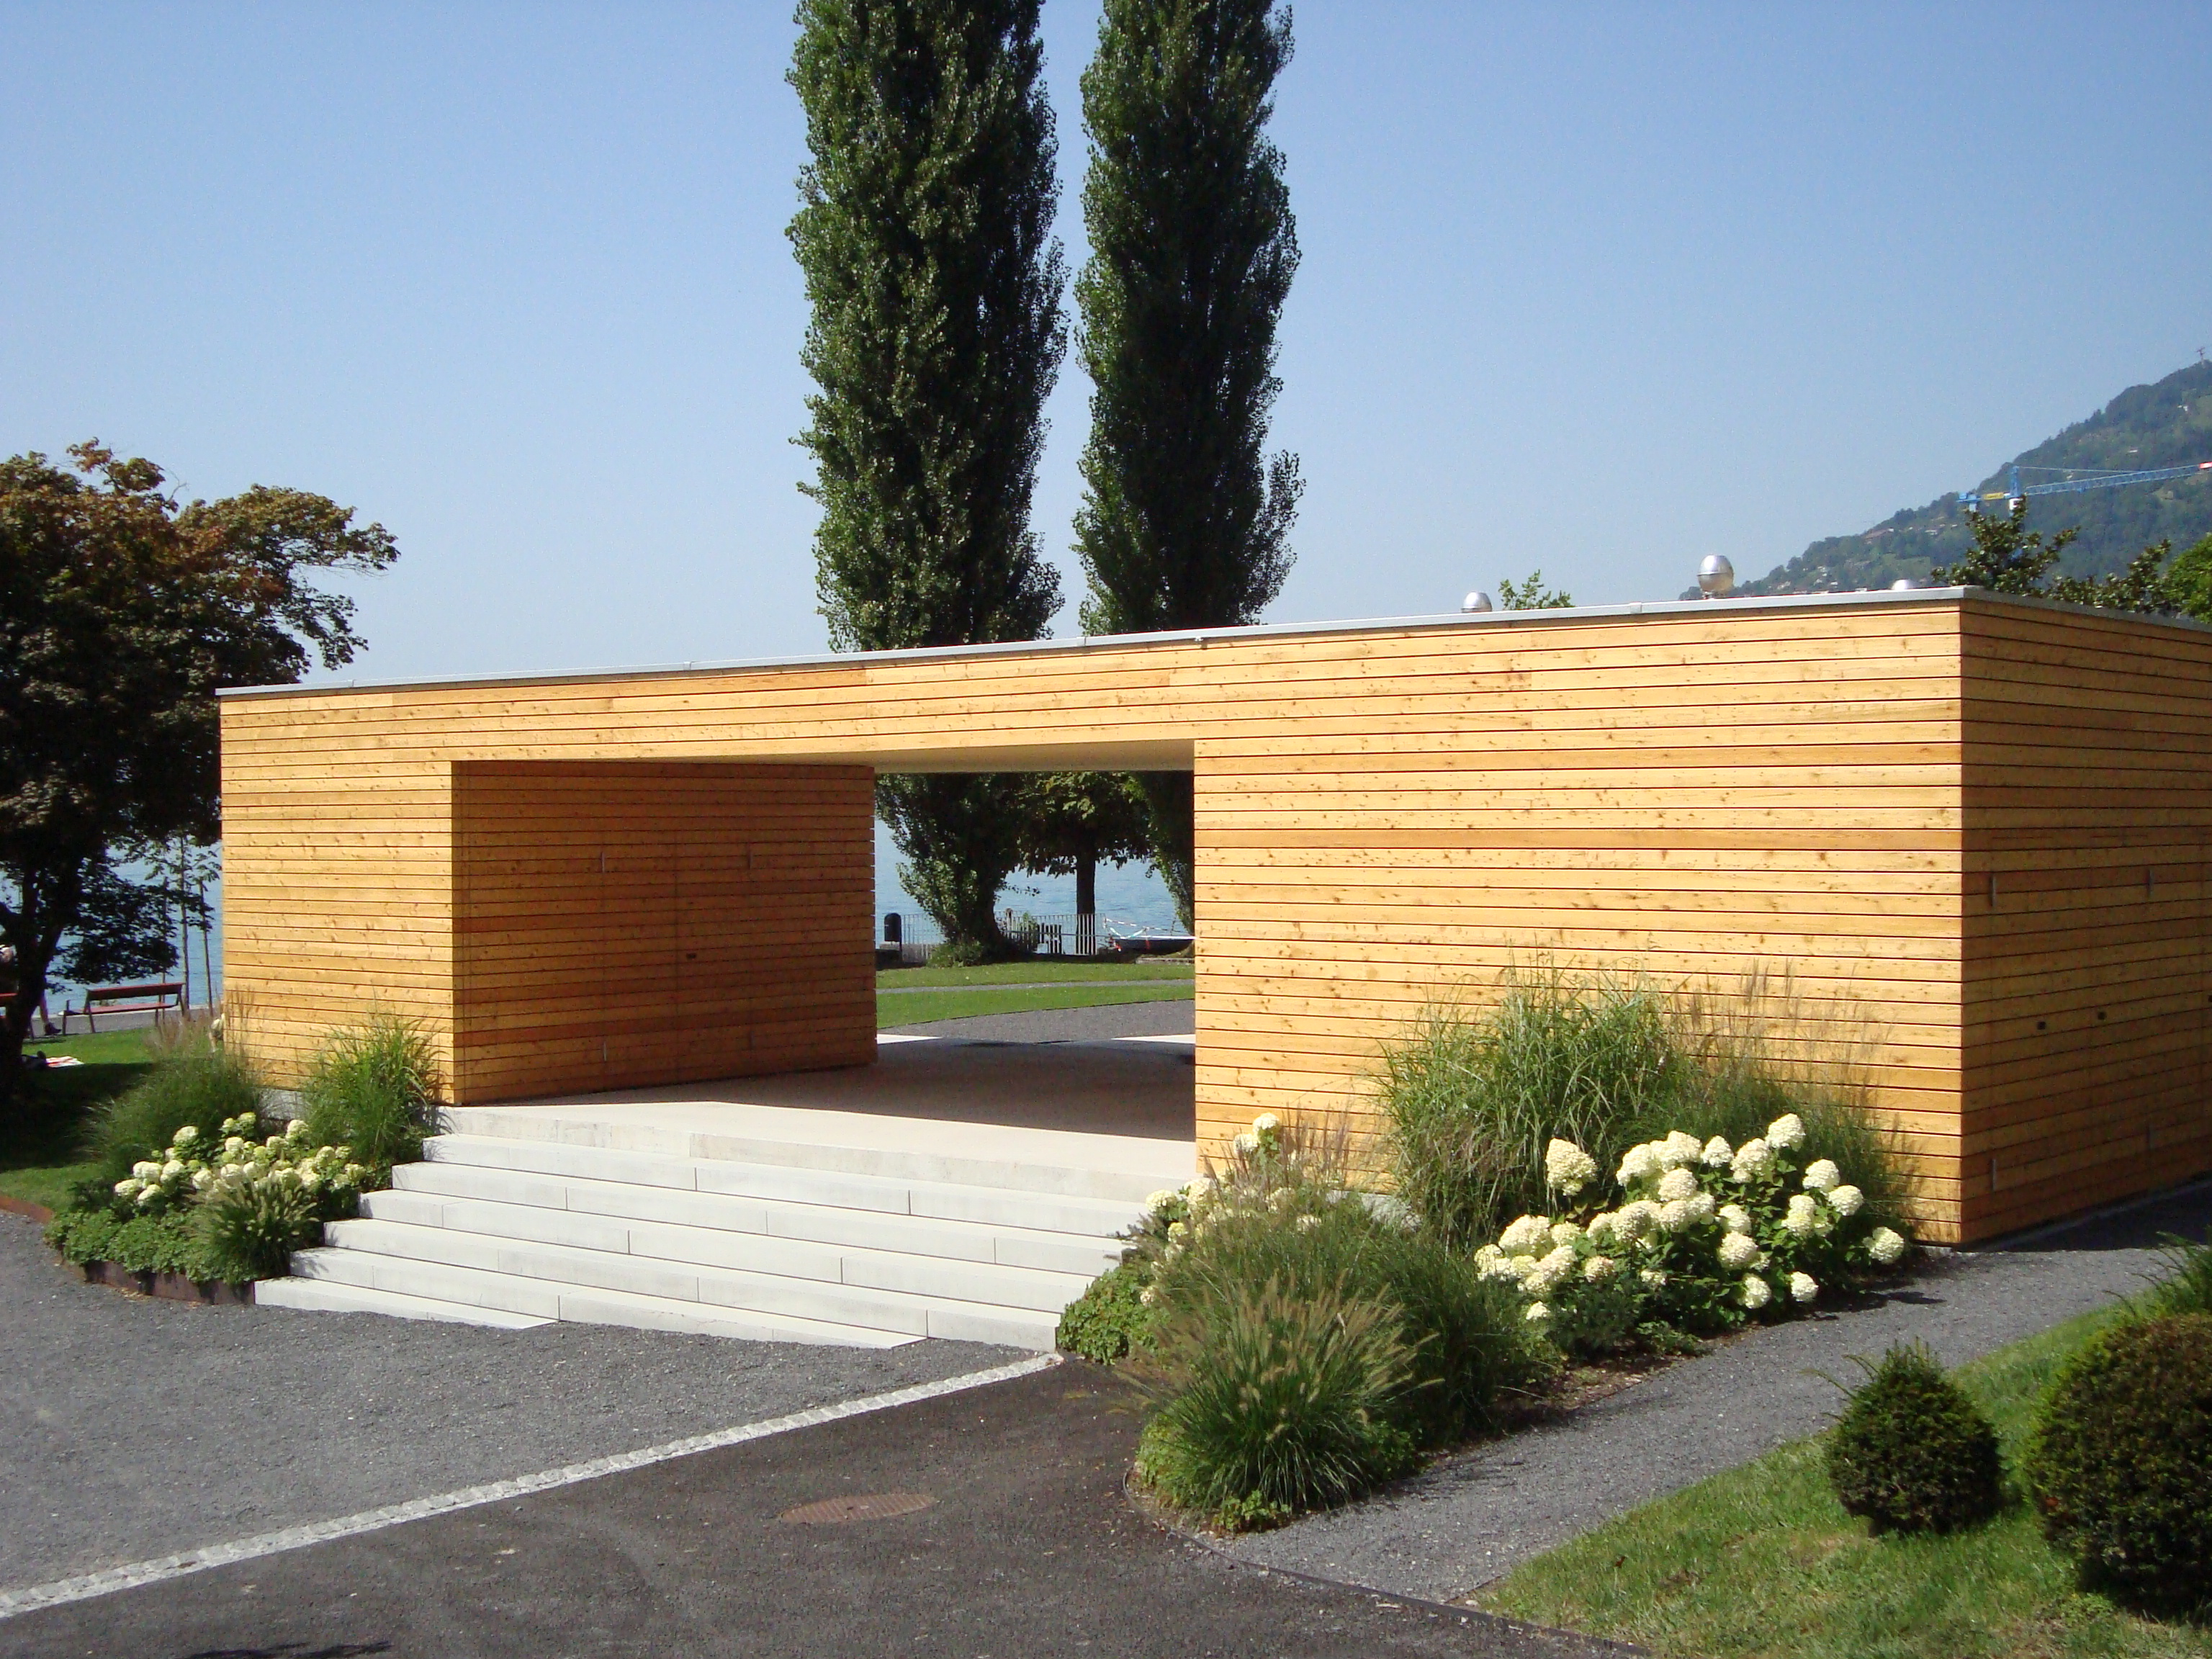 Vitznau am See | Switzerland